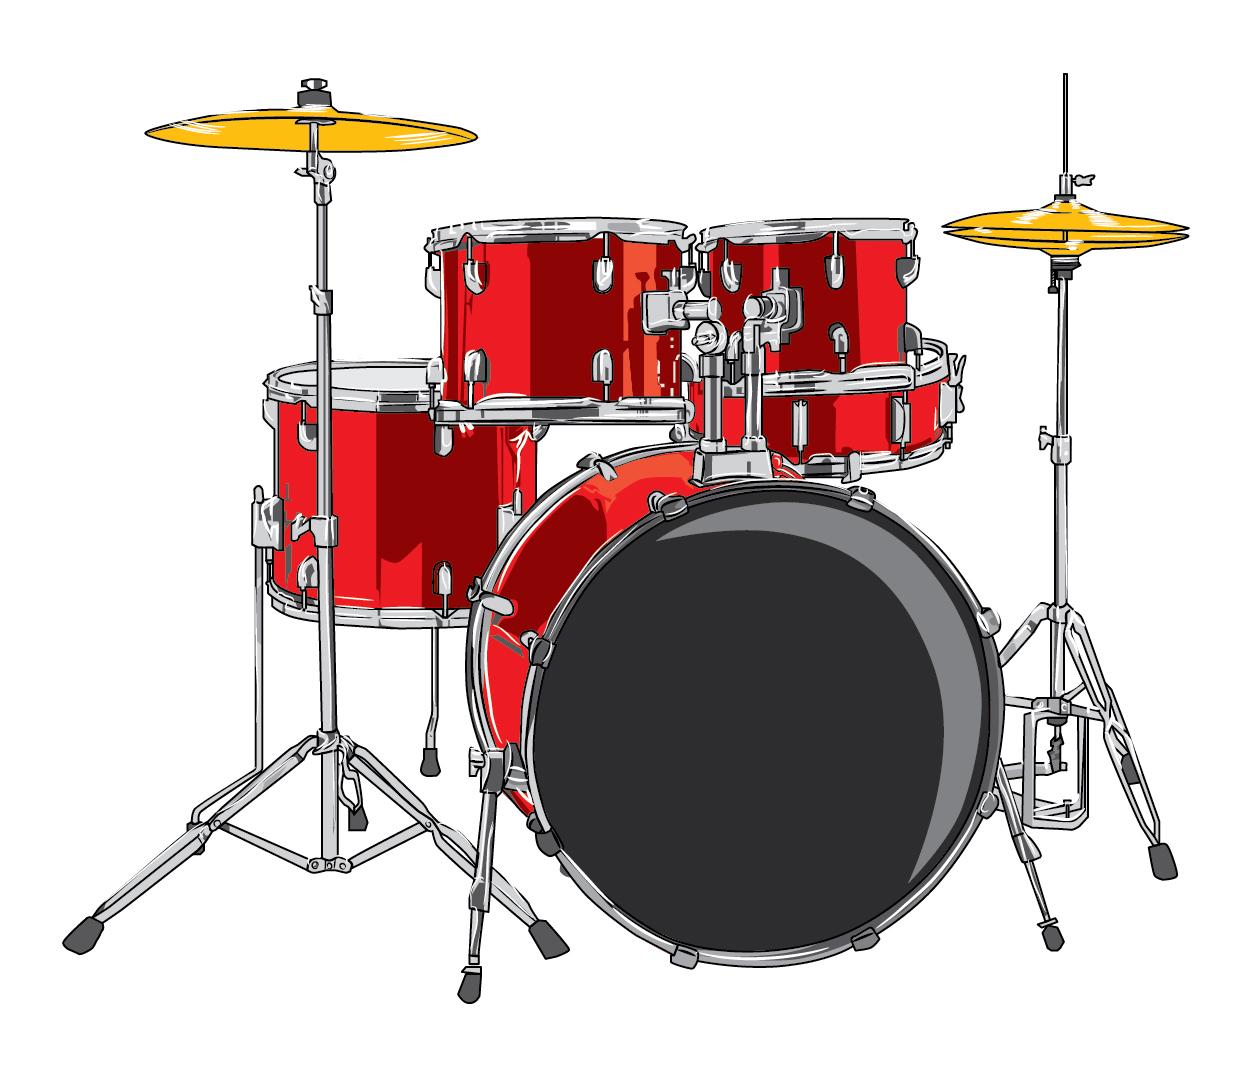 TL_DrumsColor150ppi.jpg